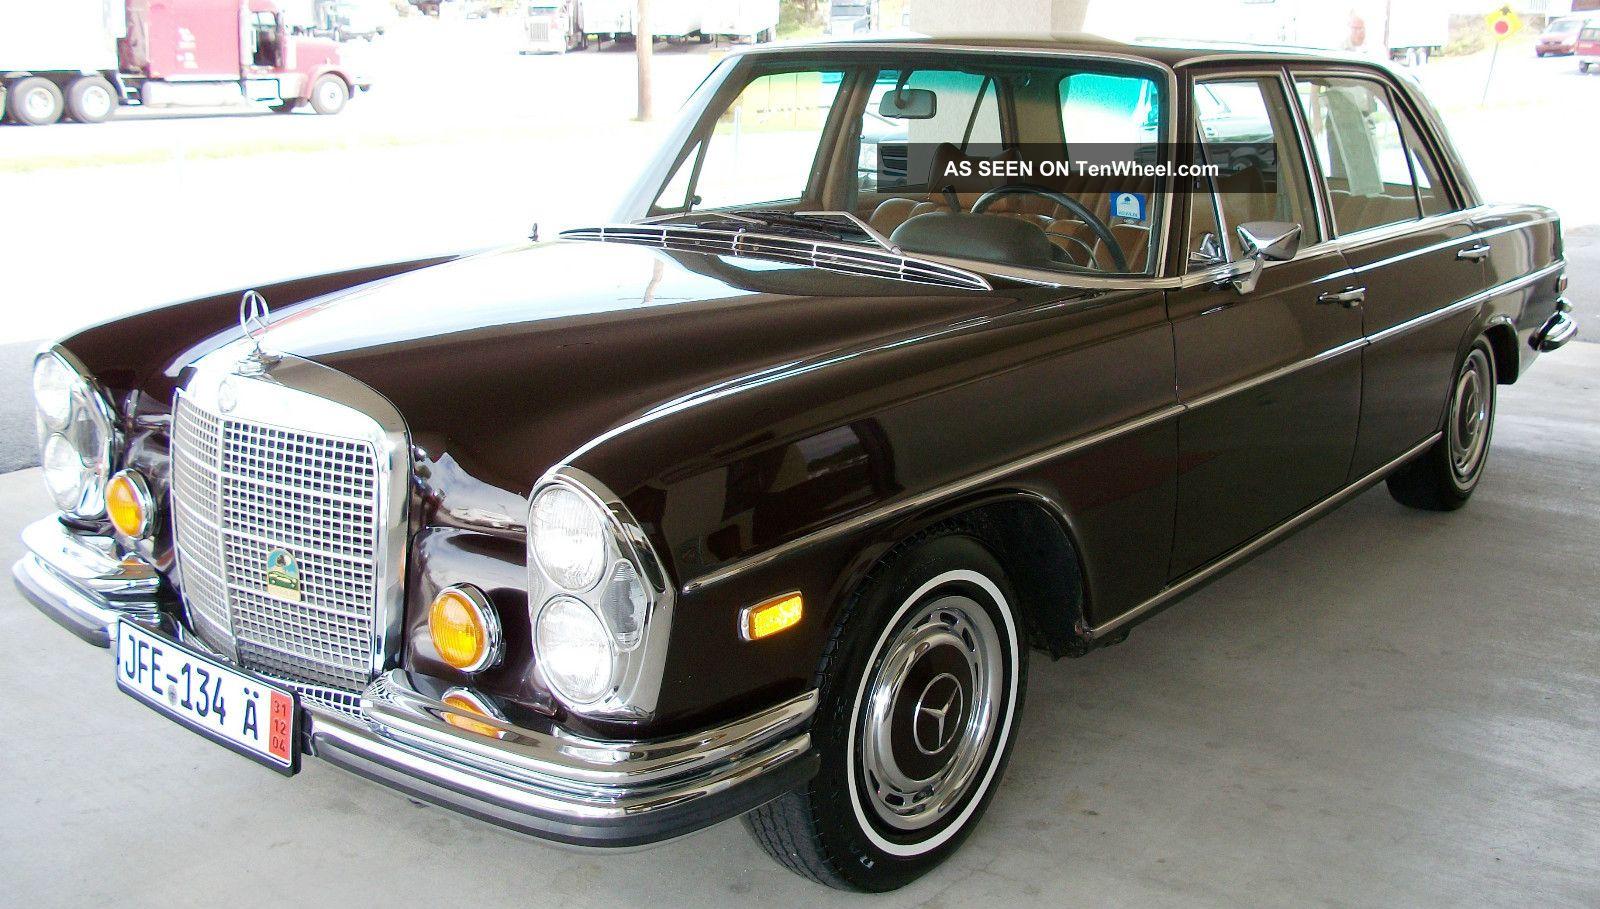 1970 mercedes benz 280 sel 200 series photo